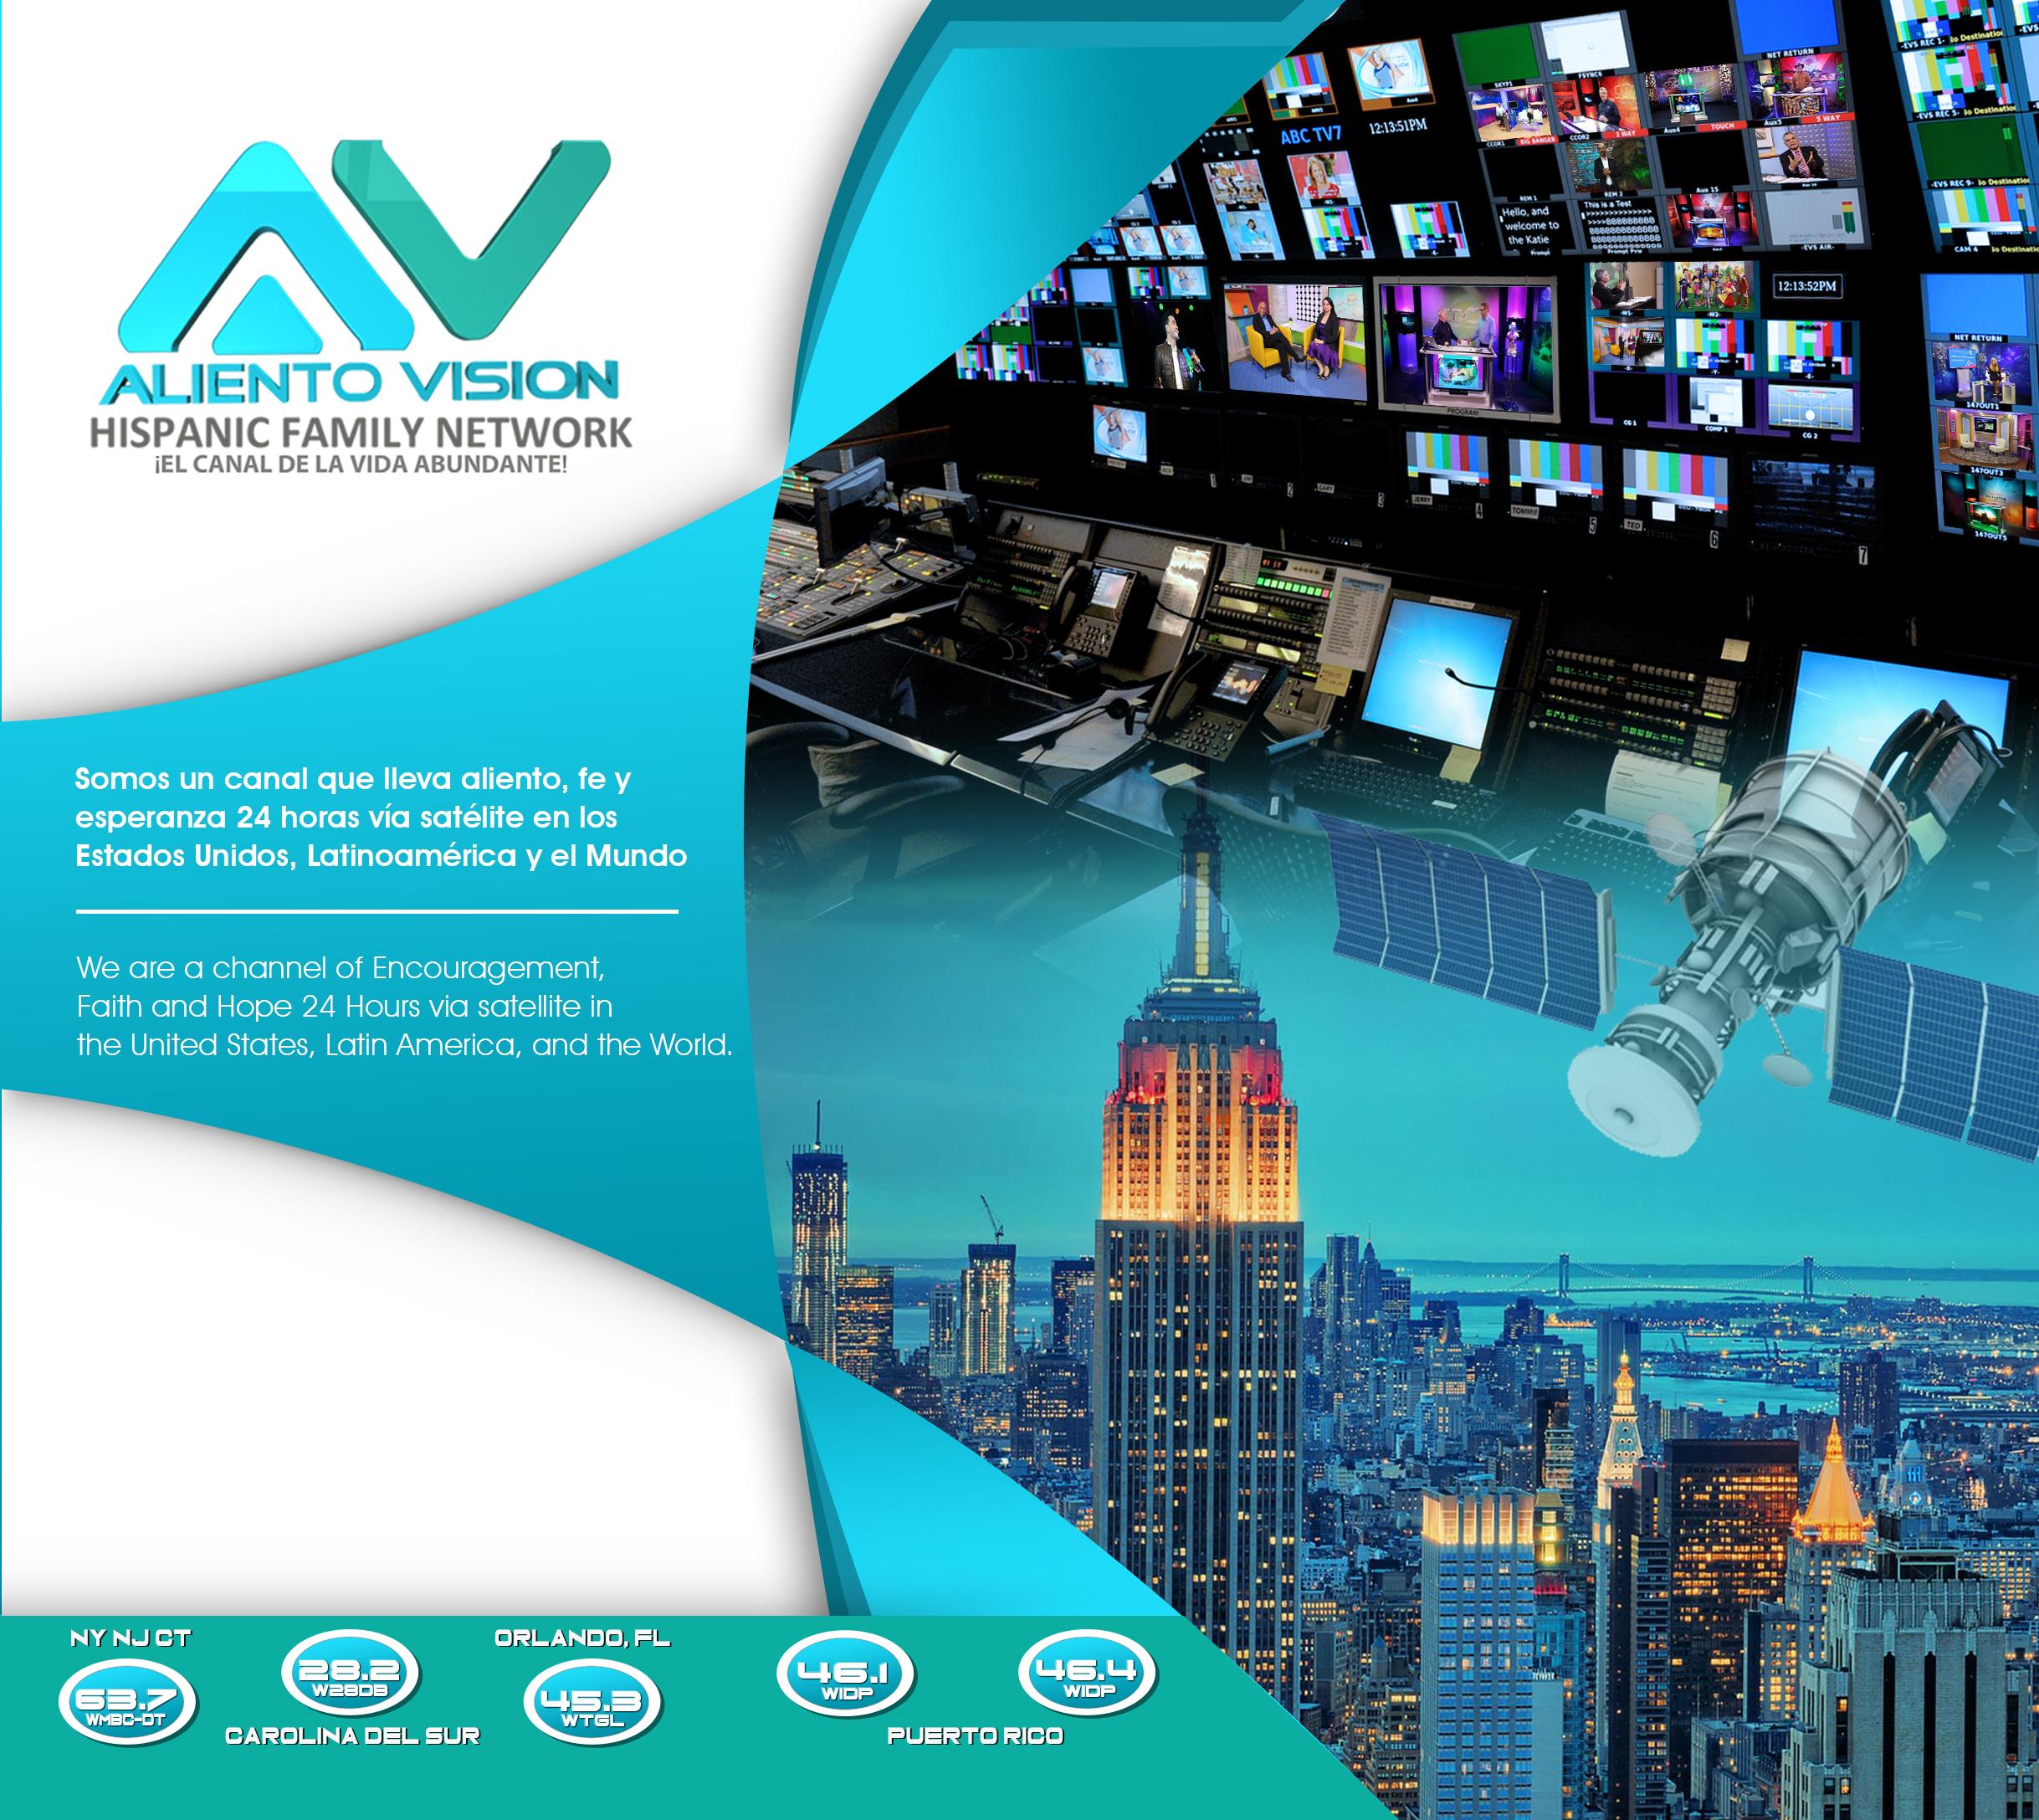 MEDIA KIT ALIENTO VISION 01.jpg